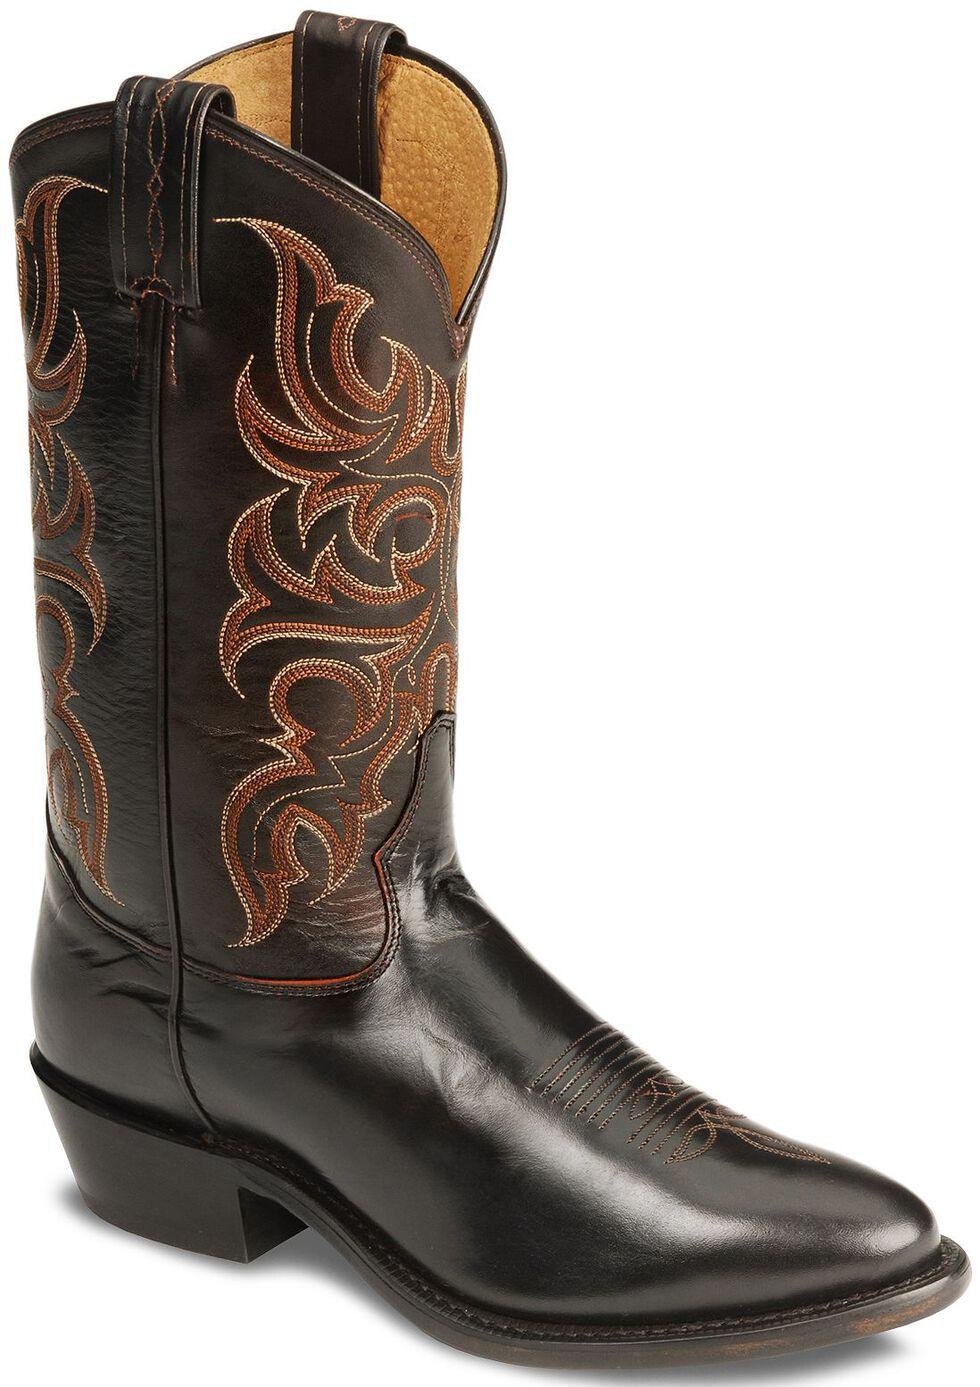 Tony Lama Regal Americana Boots - Medium Toe, Peanut, hi-res